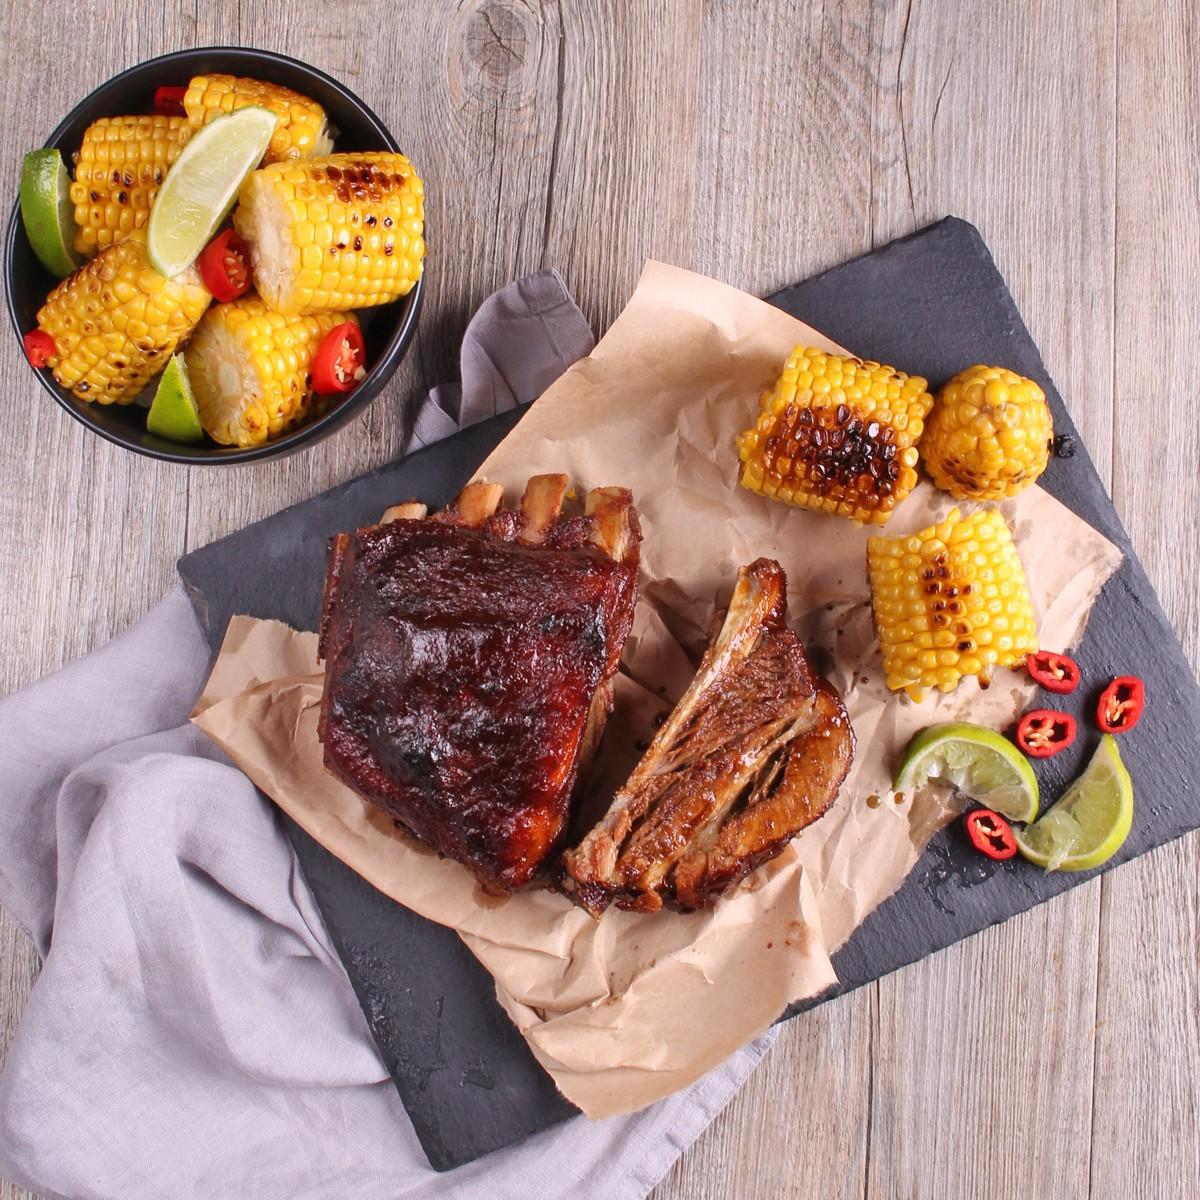 Chili & Beer BBQ Pork Ribs - Barkers Creek Meaty Riblets